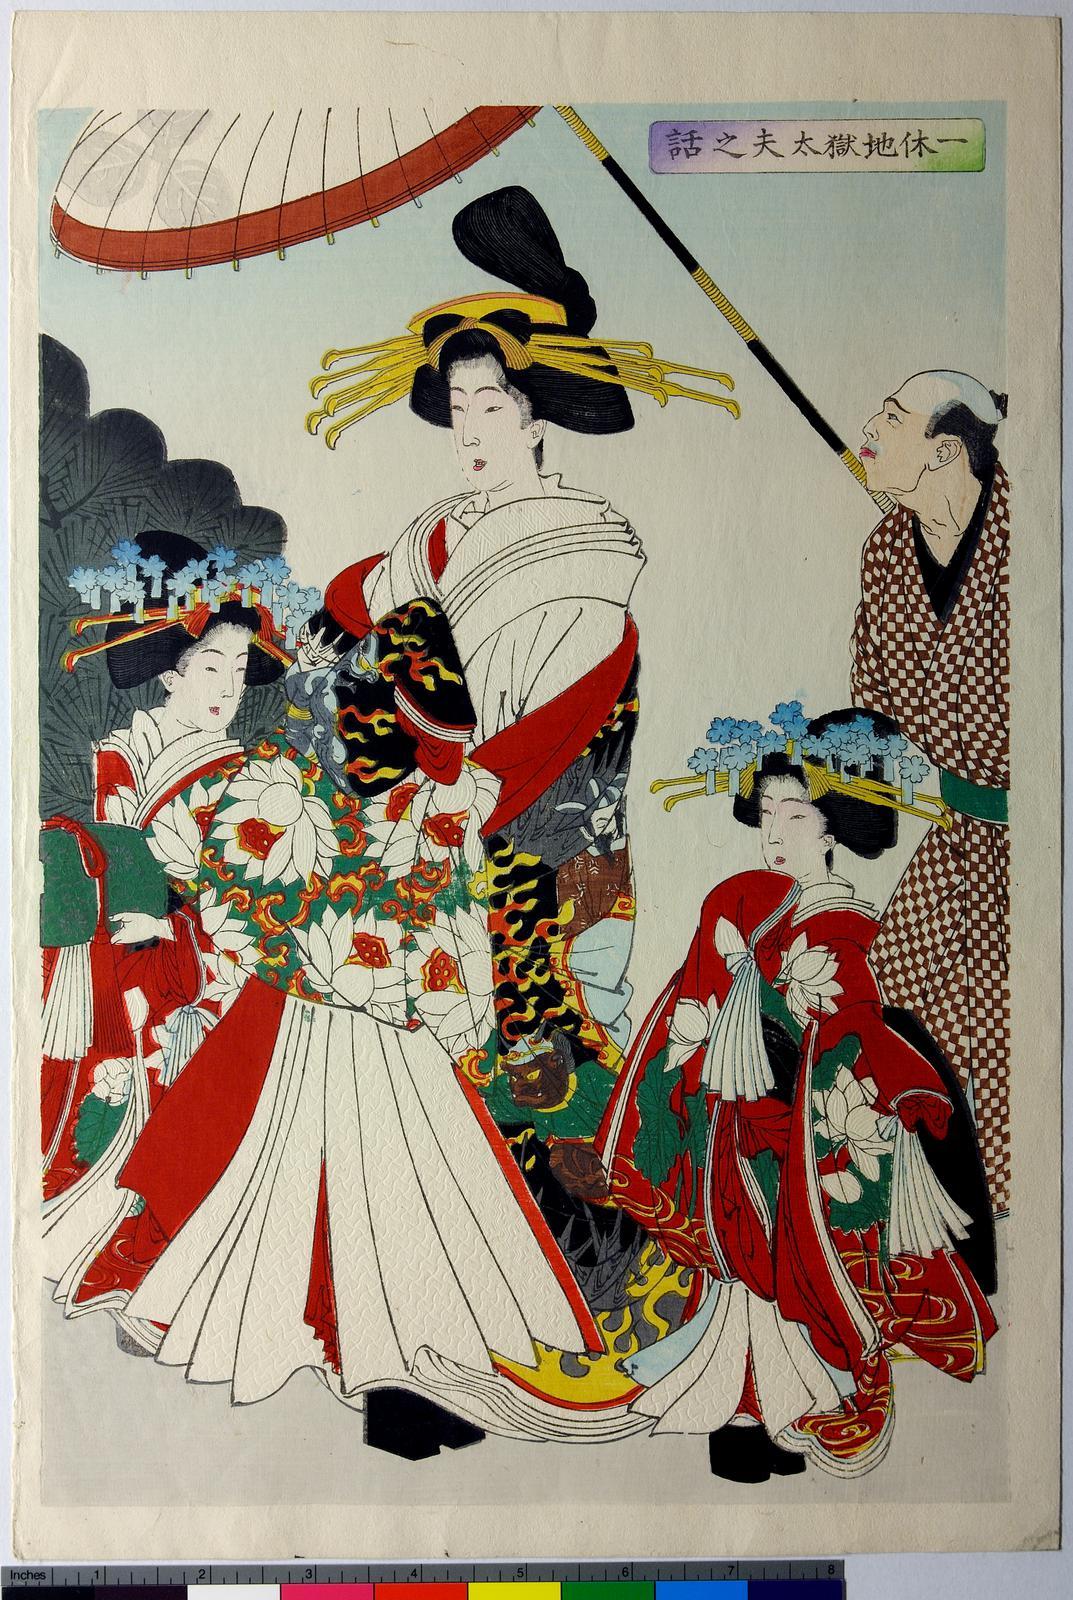 File:Diptych print (BM 2008,3037.18223).jpg - Wikimedia